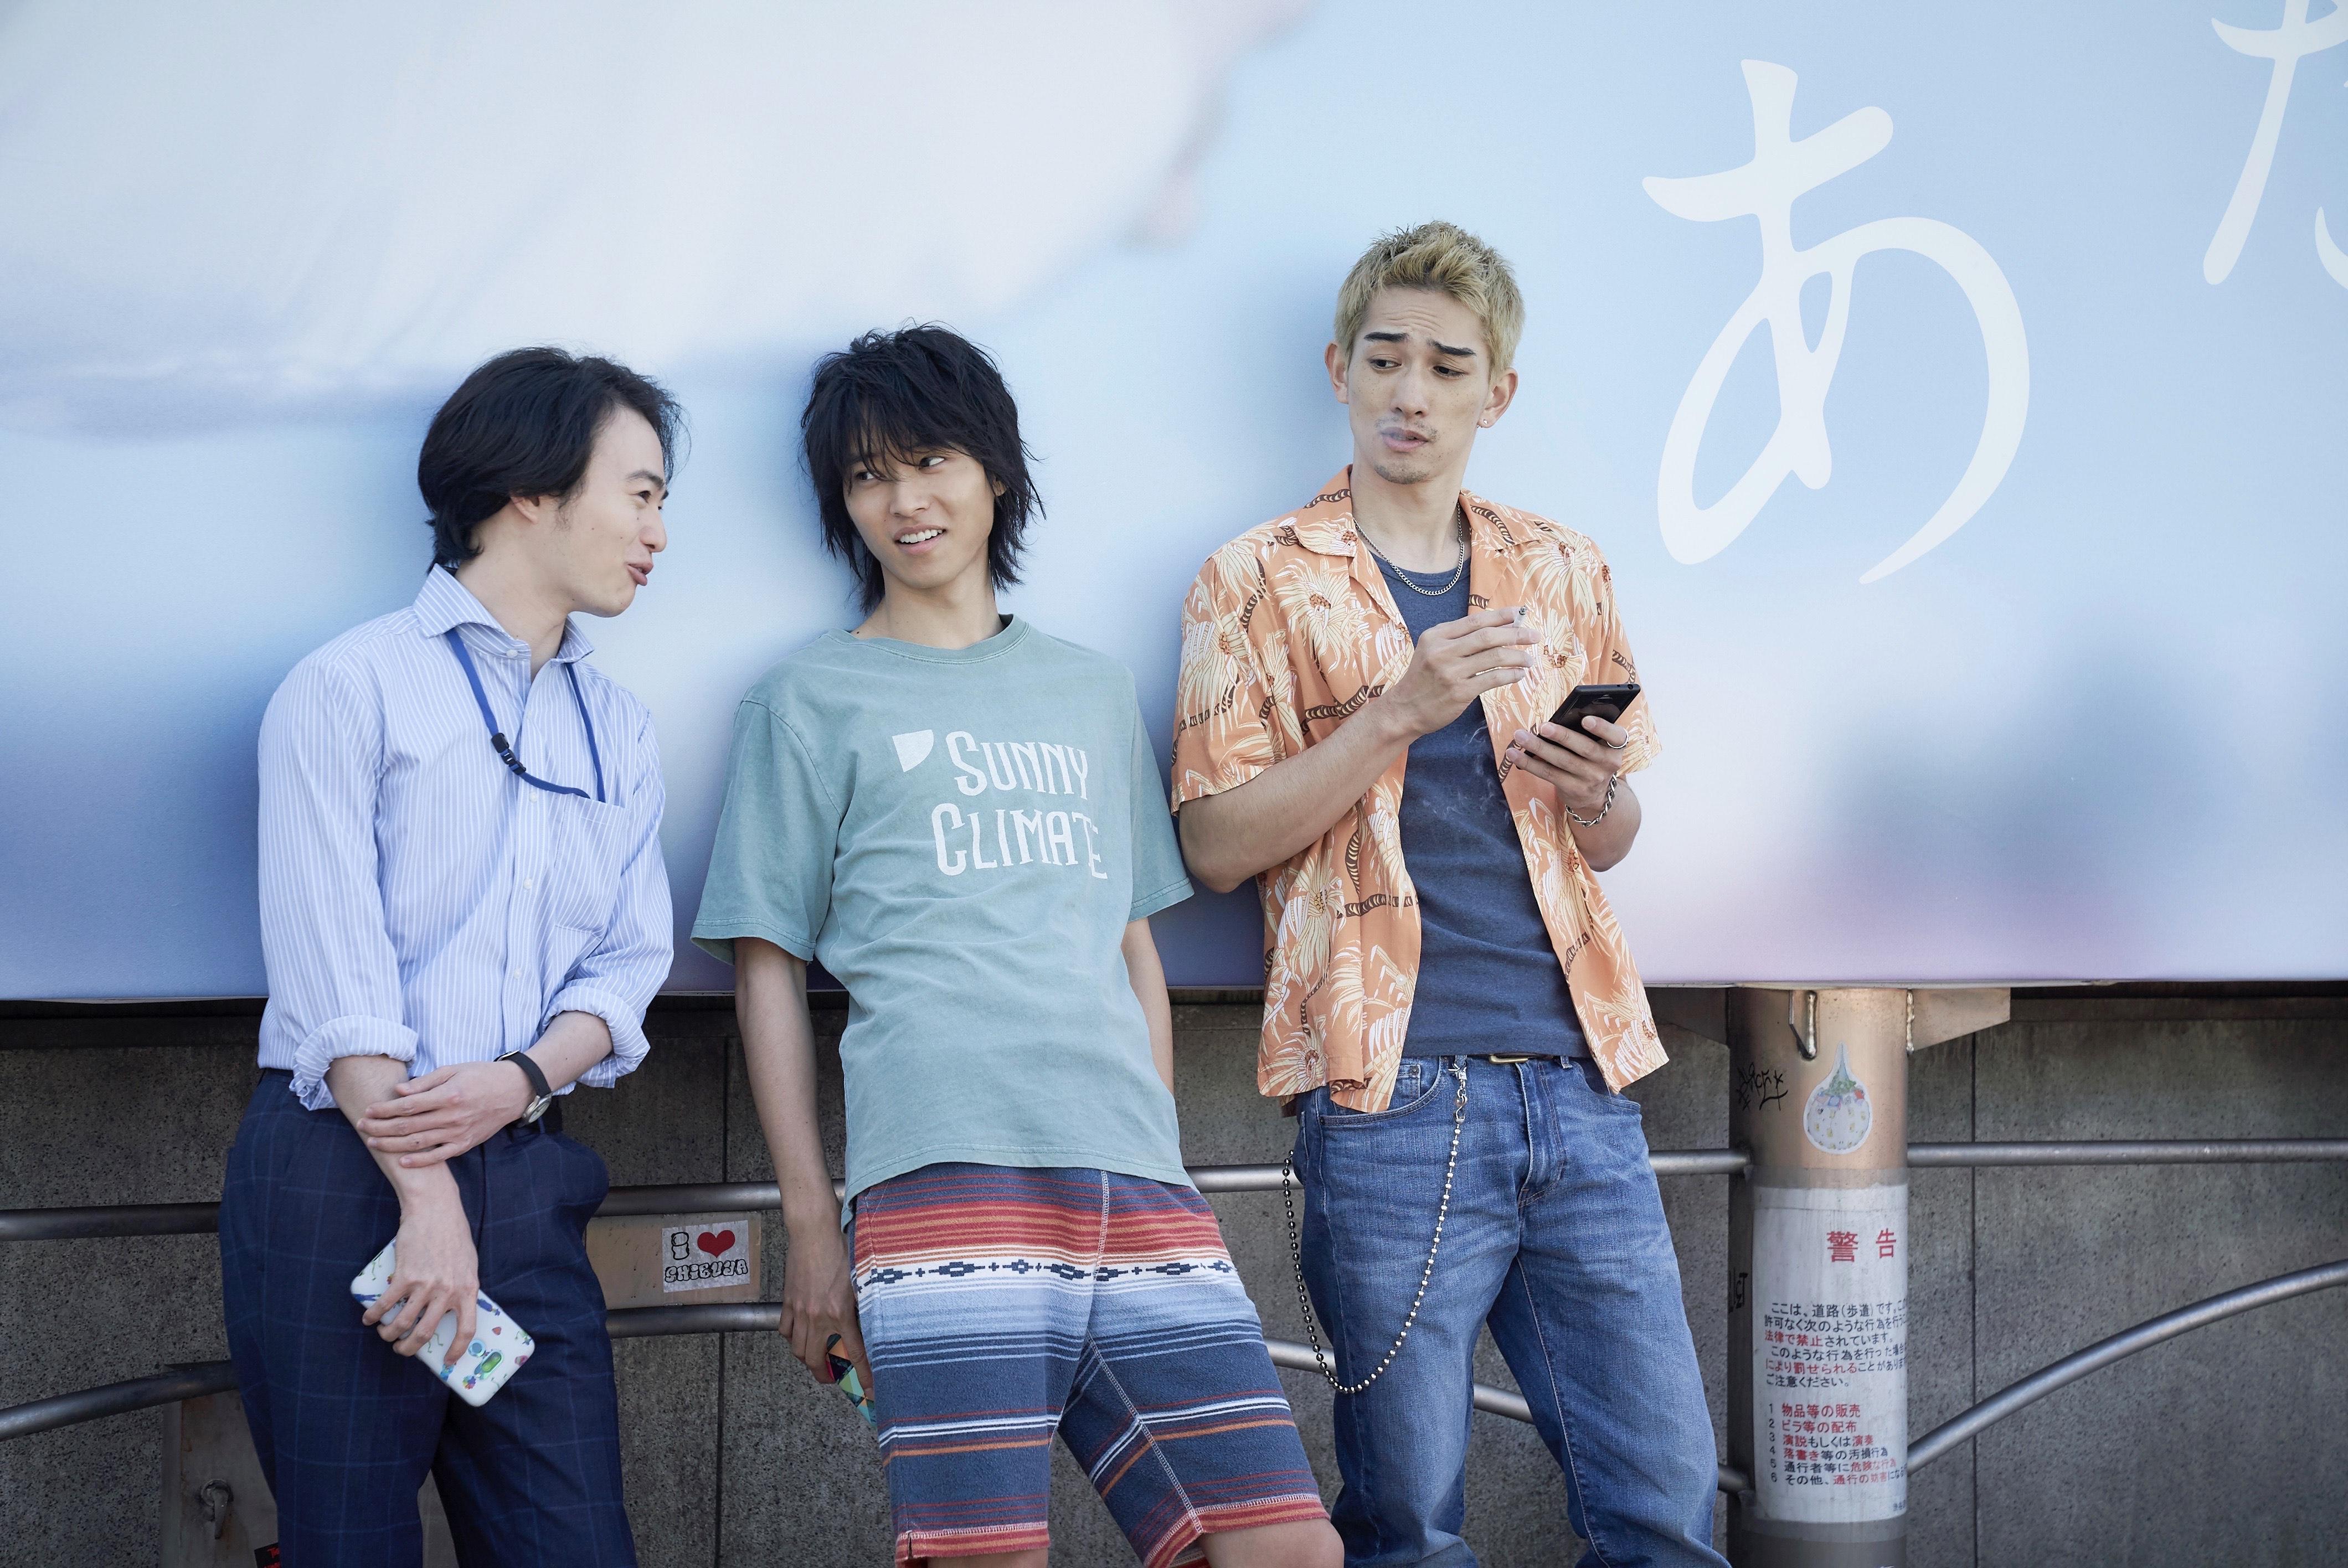 Arisu and his friends